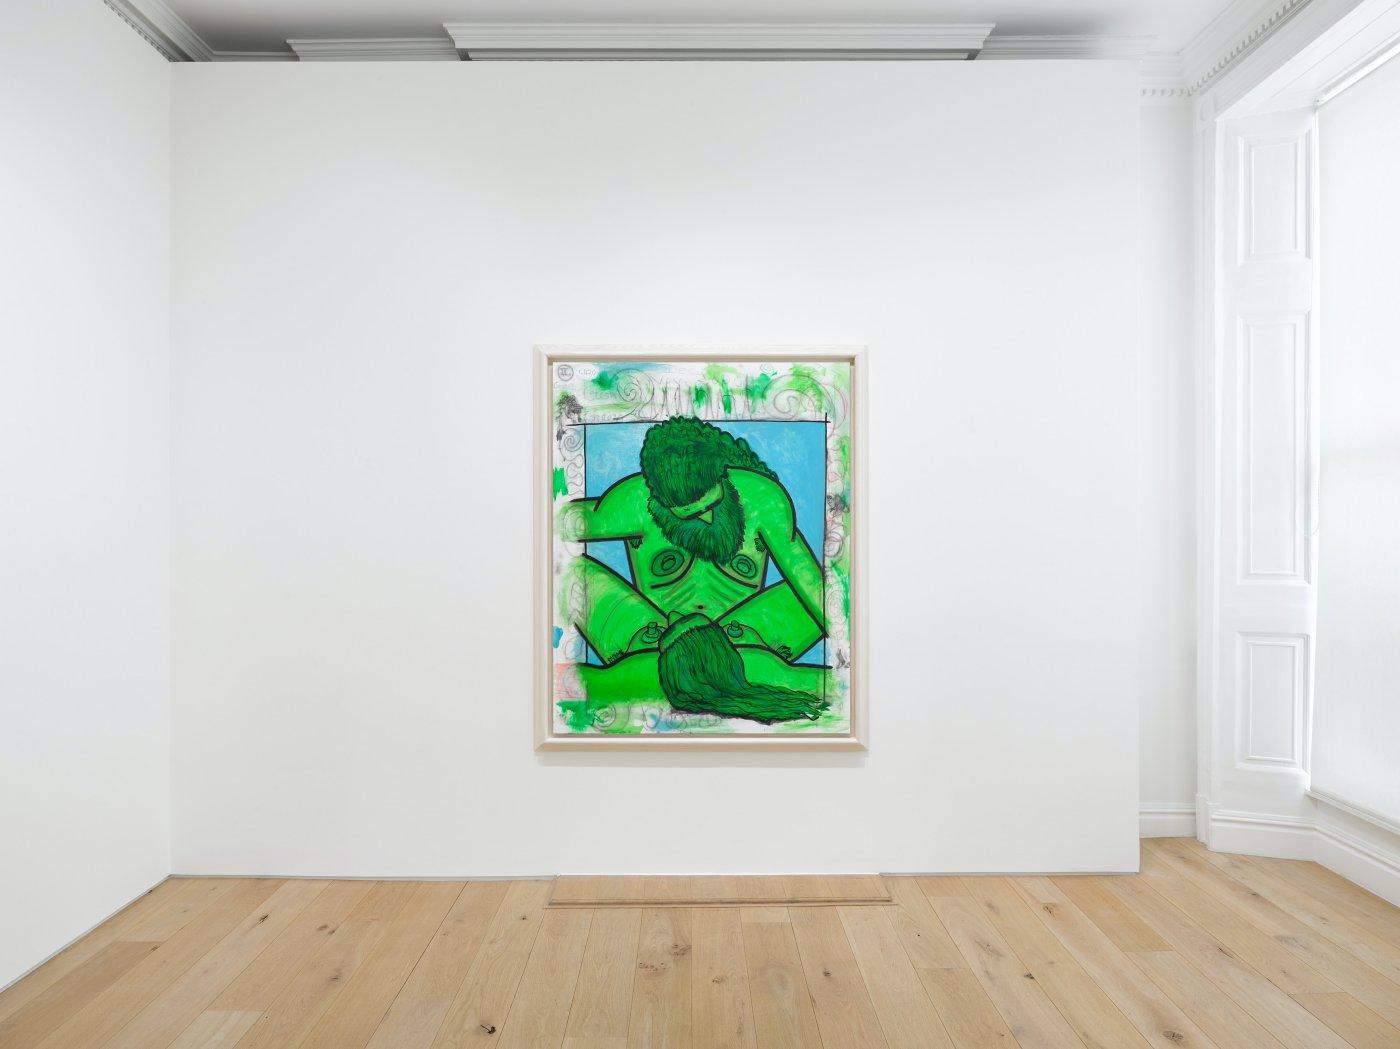 Galerie Max Hetzler London Carroll Dunham Albert Oehlen 8